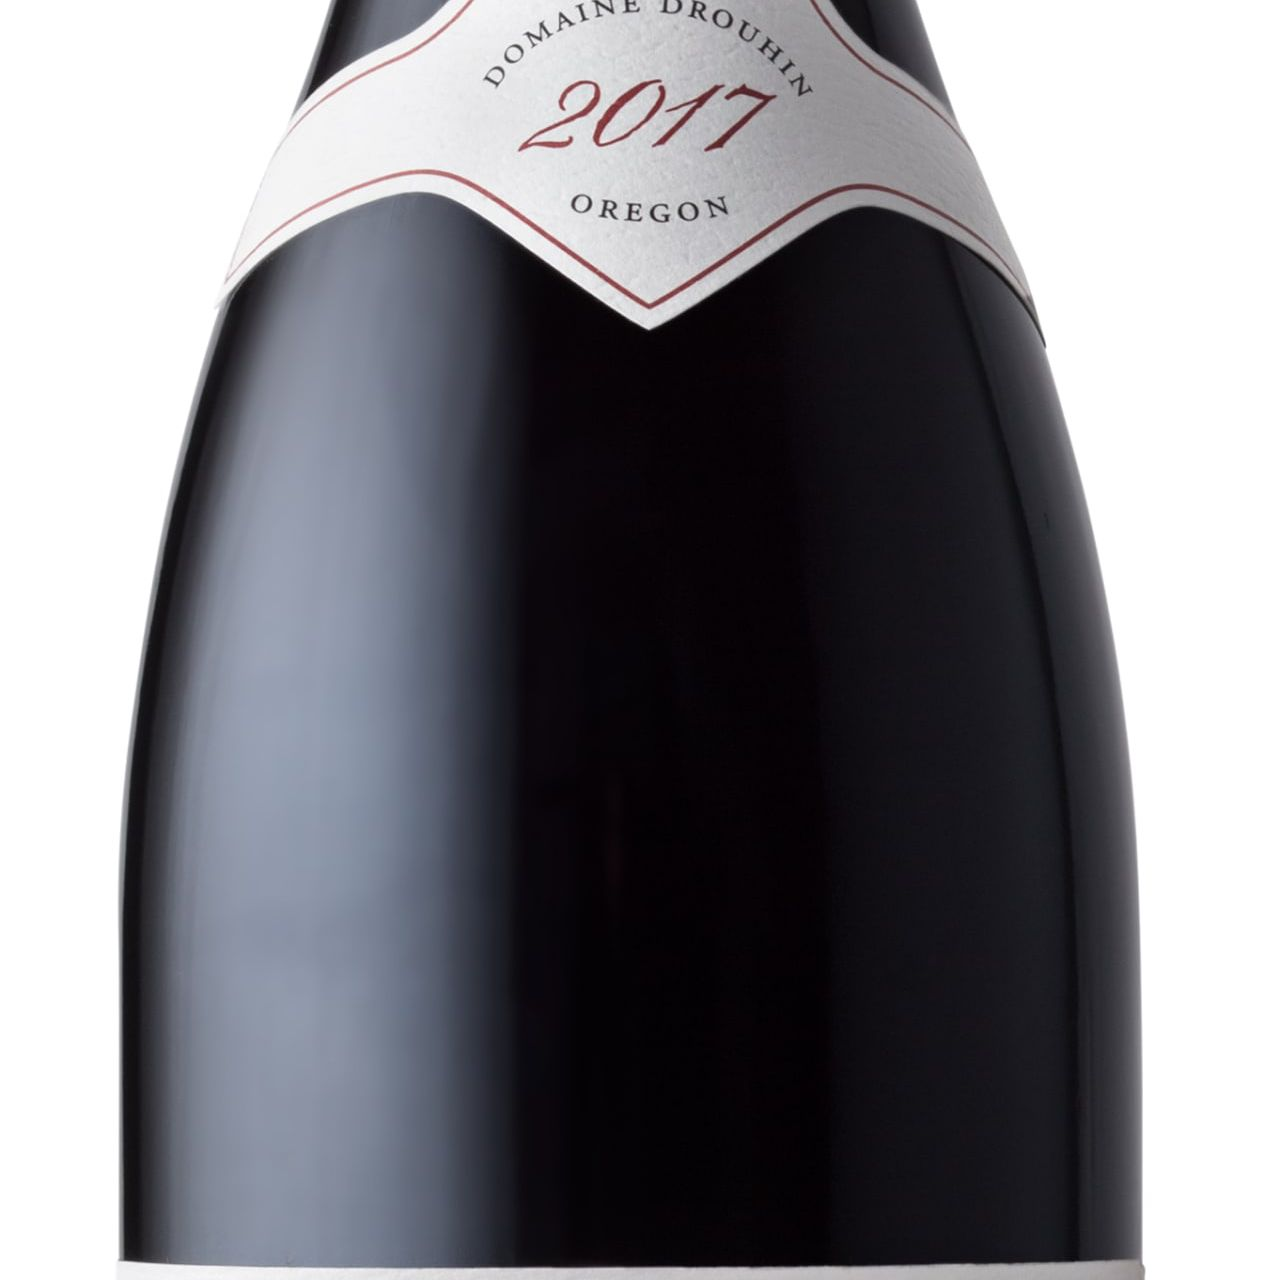 Domaine Drouhin Oregon Pinot Noir 2017